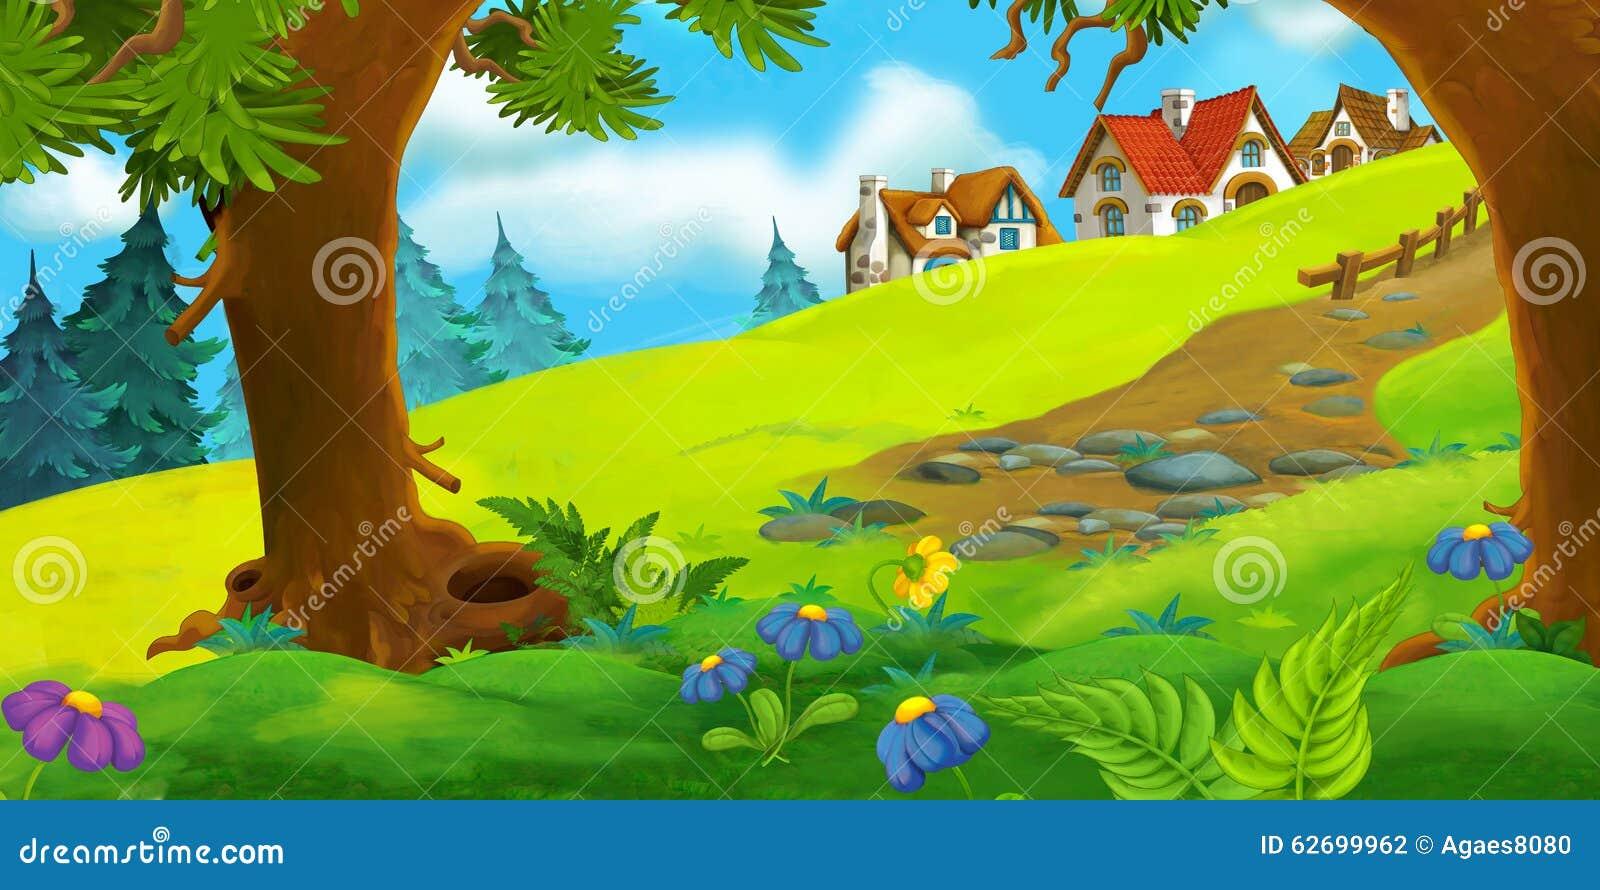 Cartoon Background Of Old Village Stock Illustration